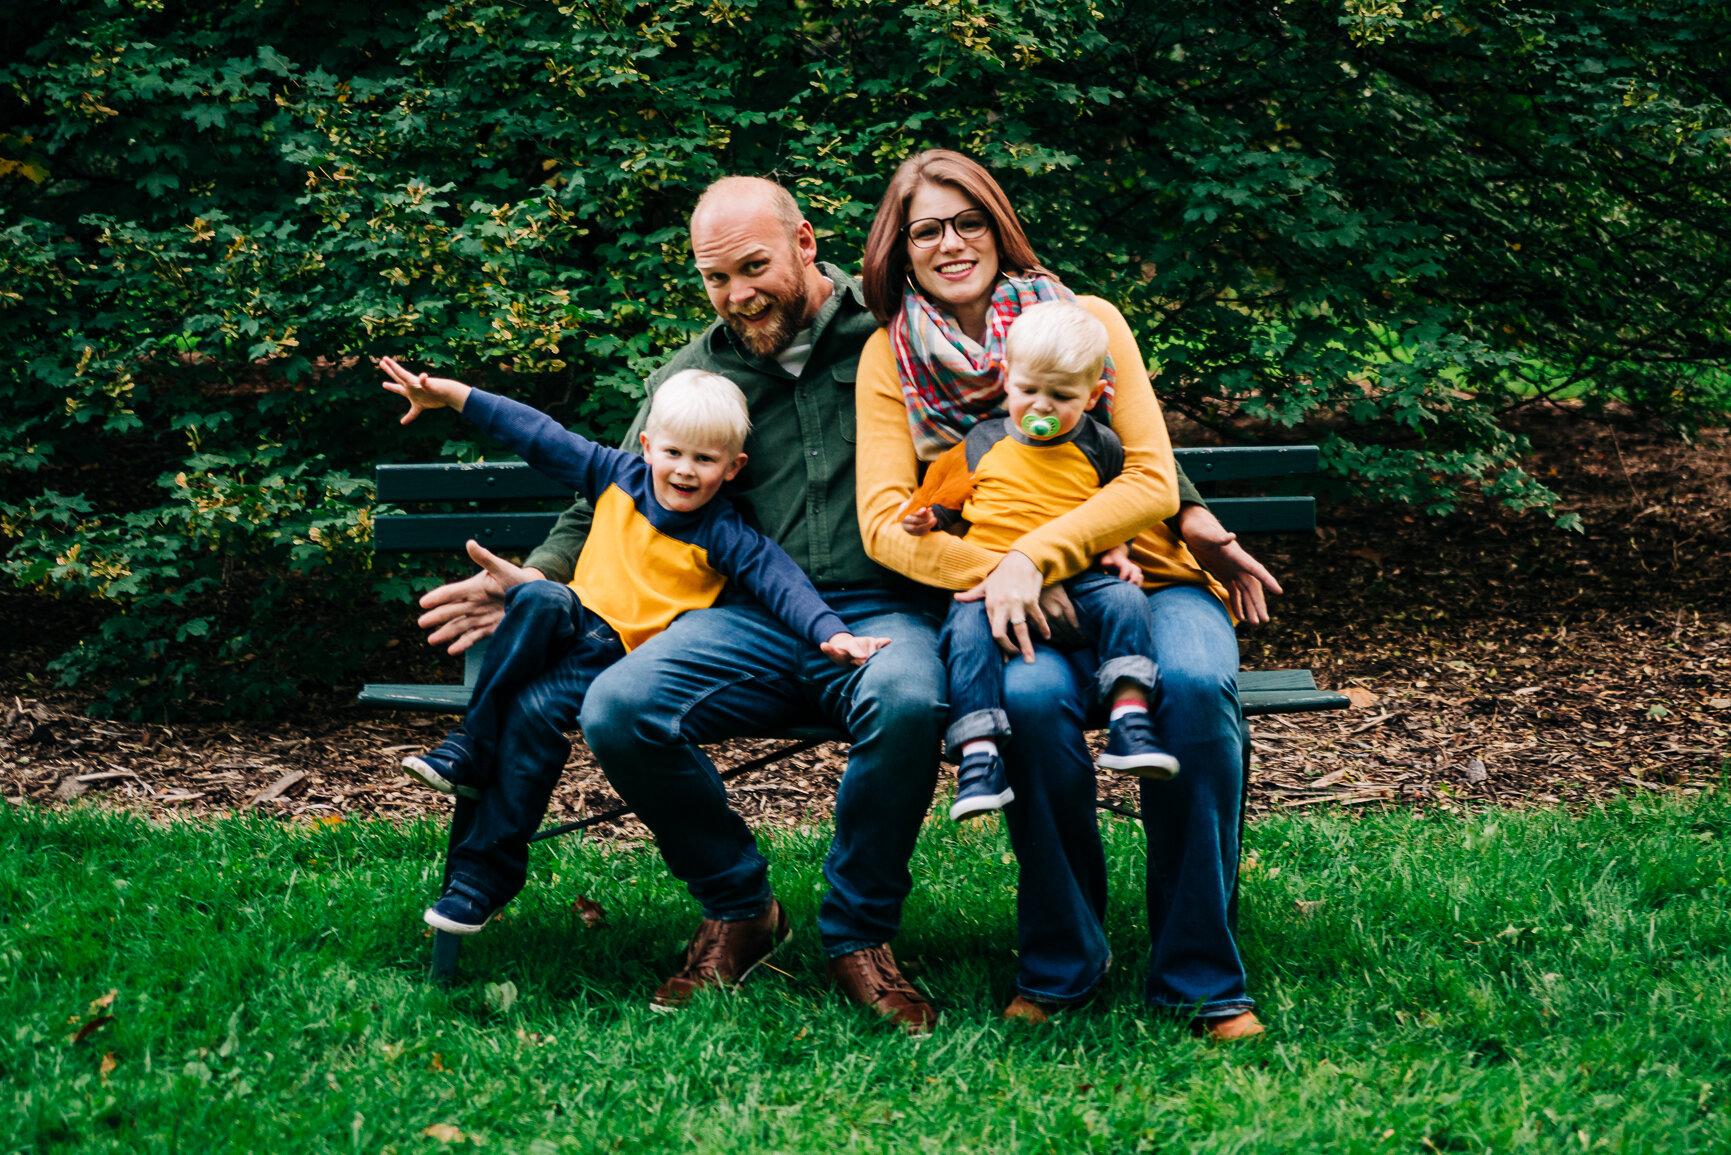 Family Portrait at Finch Arboretum in Spokane, Wa